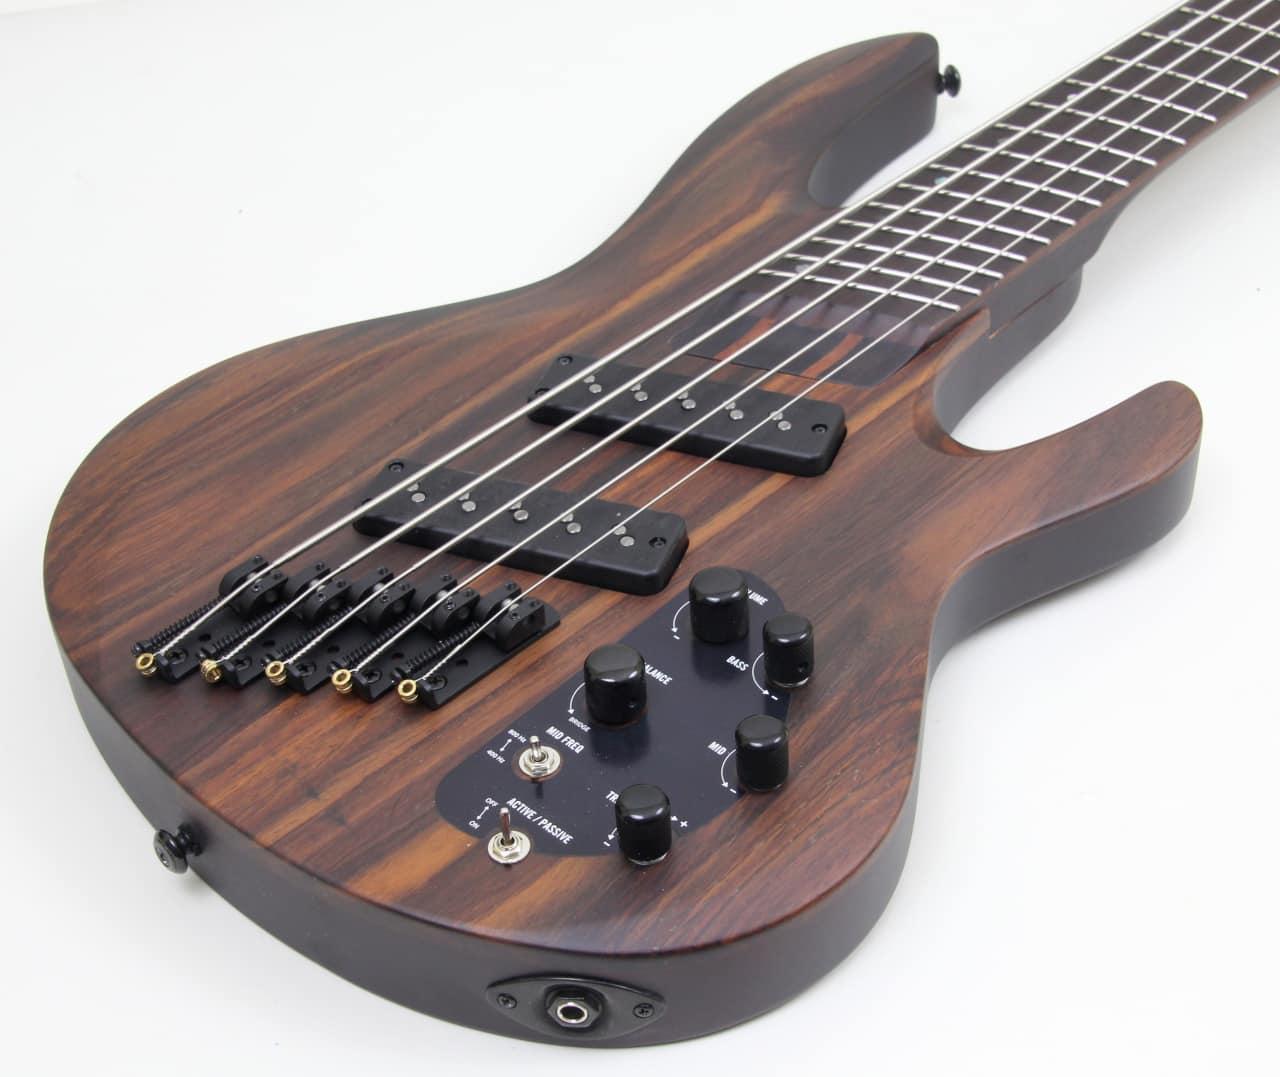 ltd b 1005se multi scale 5 string bass guitar right handed reverb. Black Bedroom Furniture Sets. Home Design Ideas